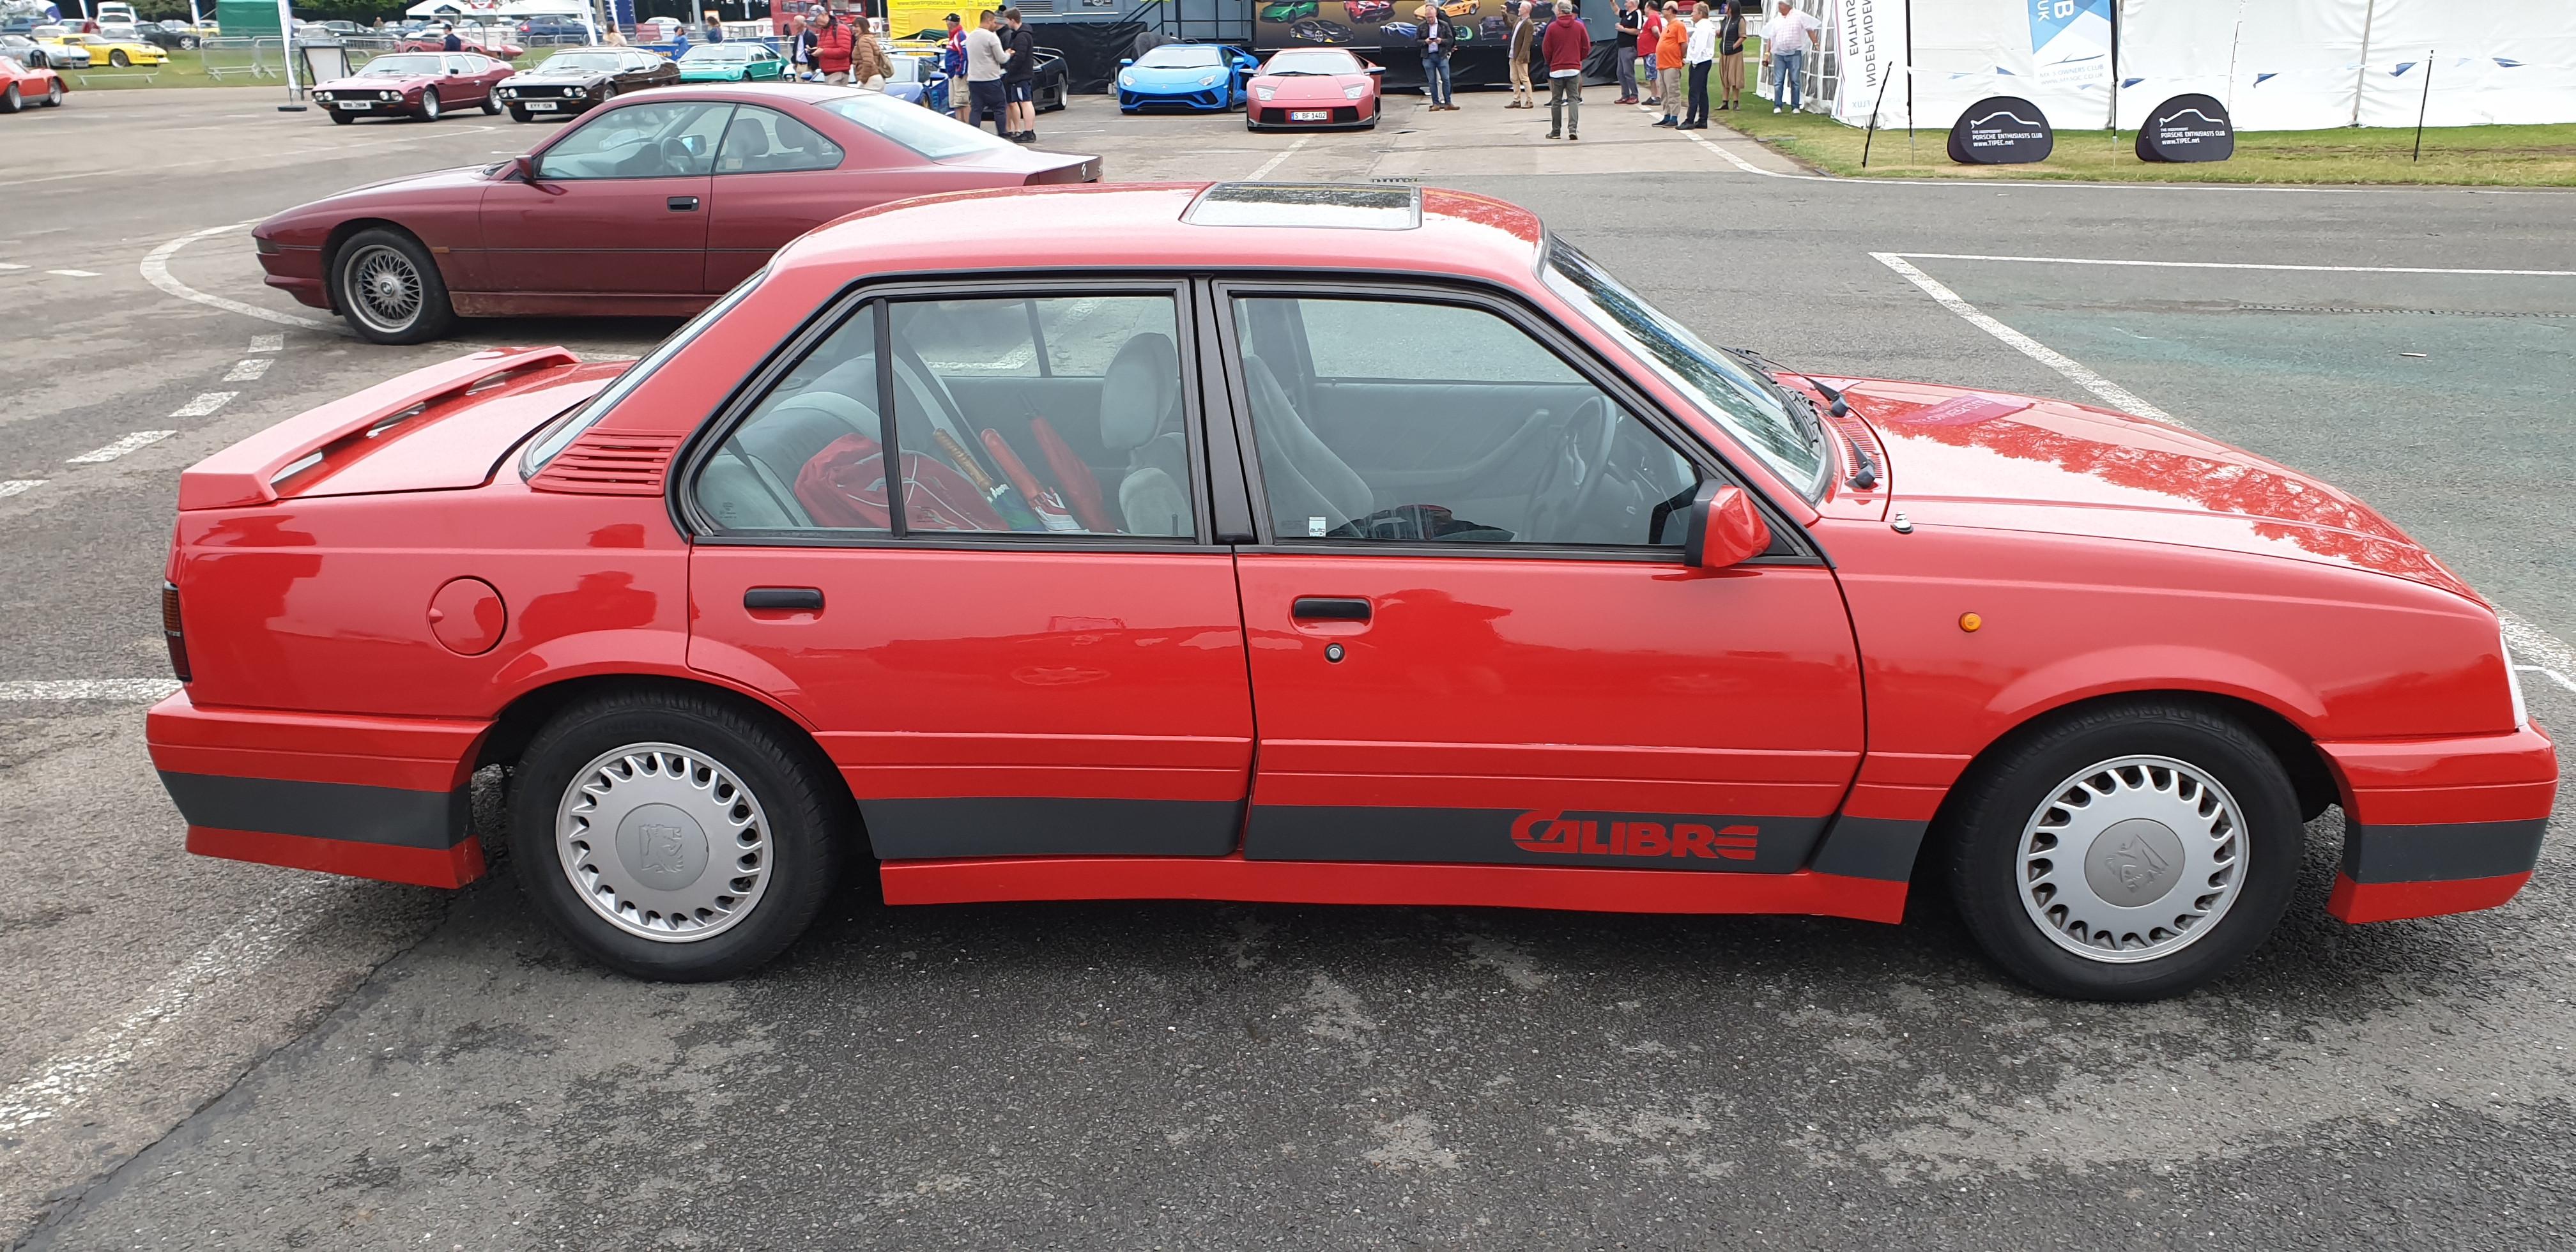 Vauxhall Cavalier Mk2 Calibre Hire Milton Keynes